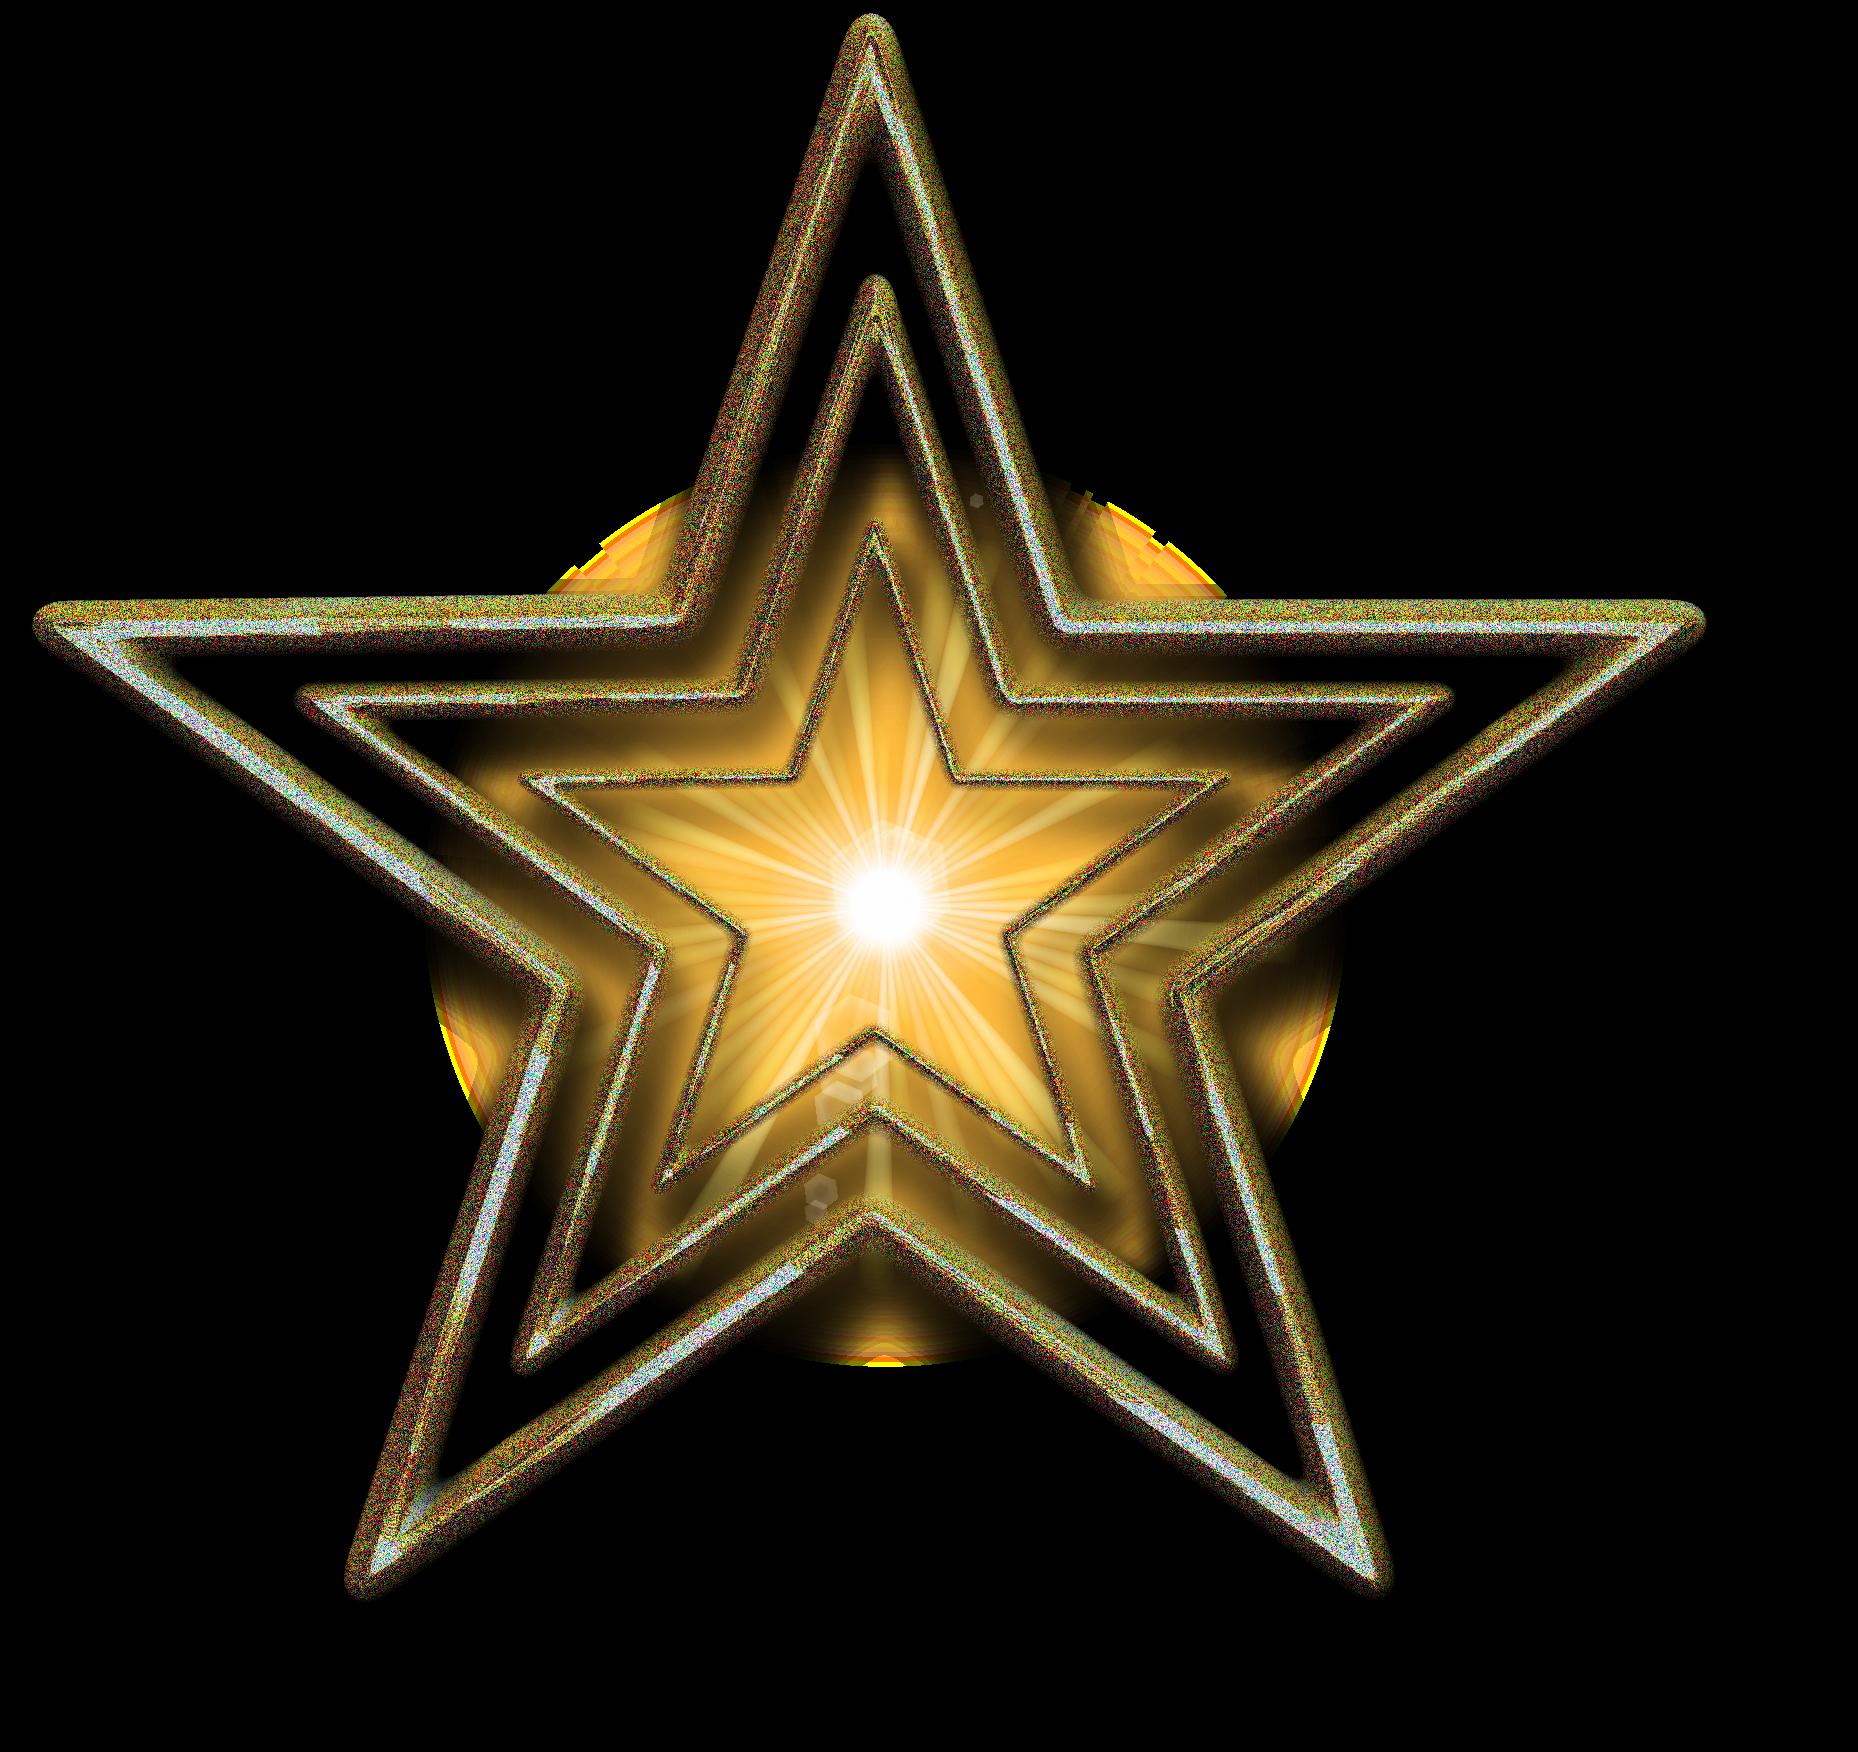 Star stars pinterest glitter. Planets clipart glowing